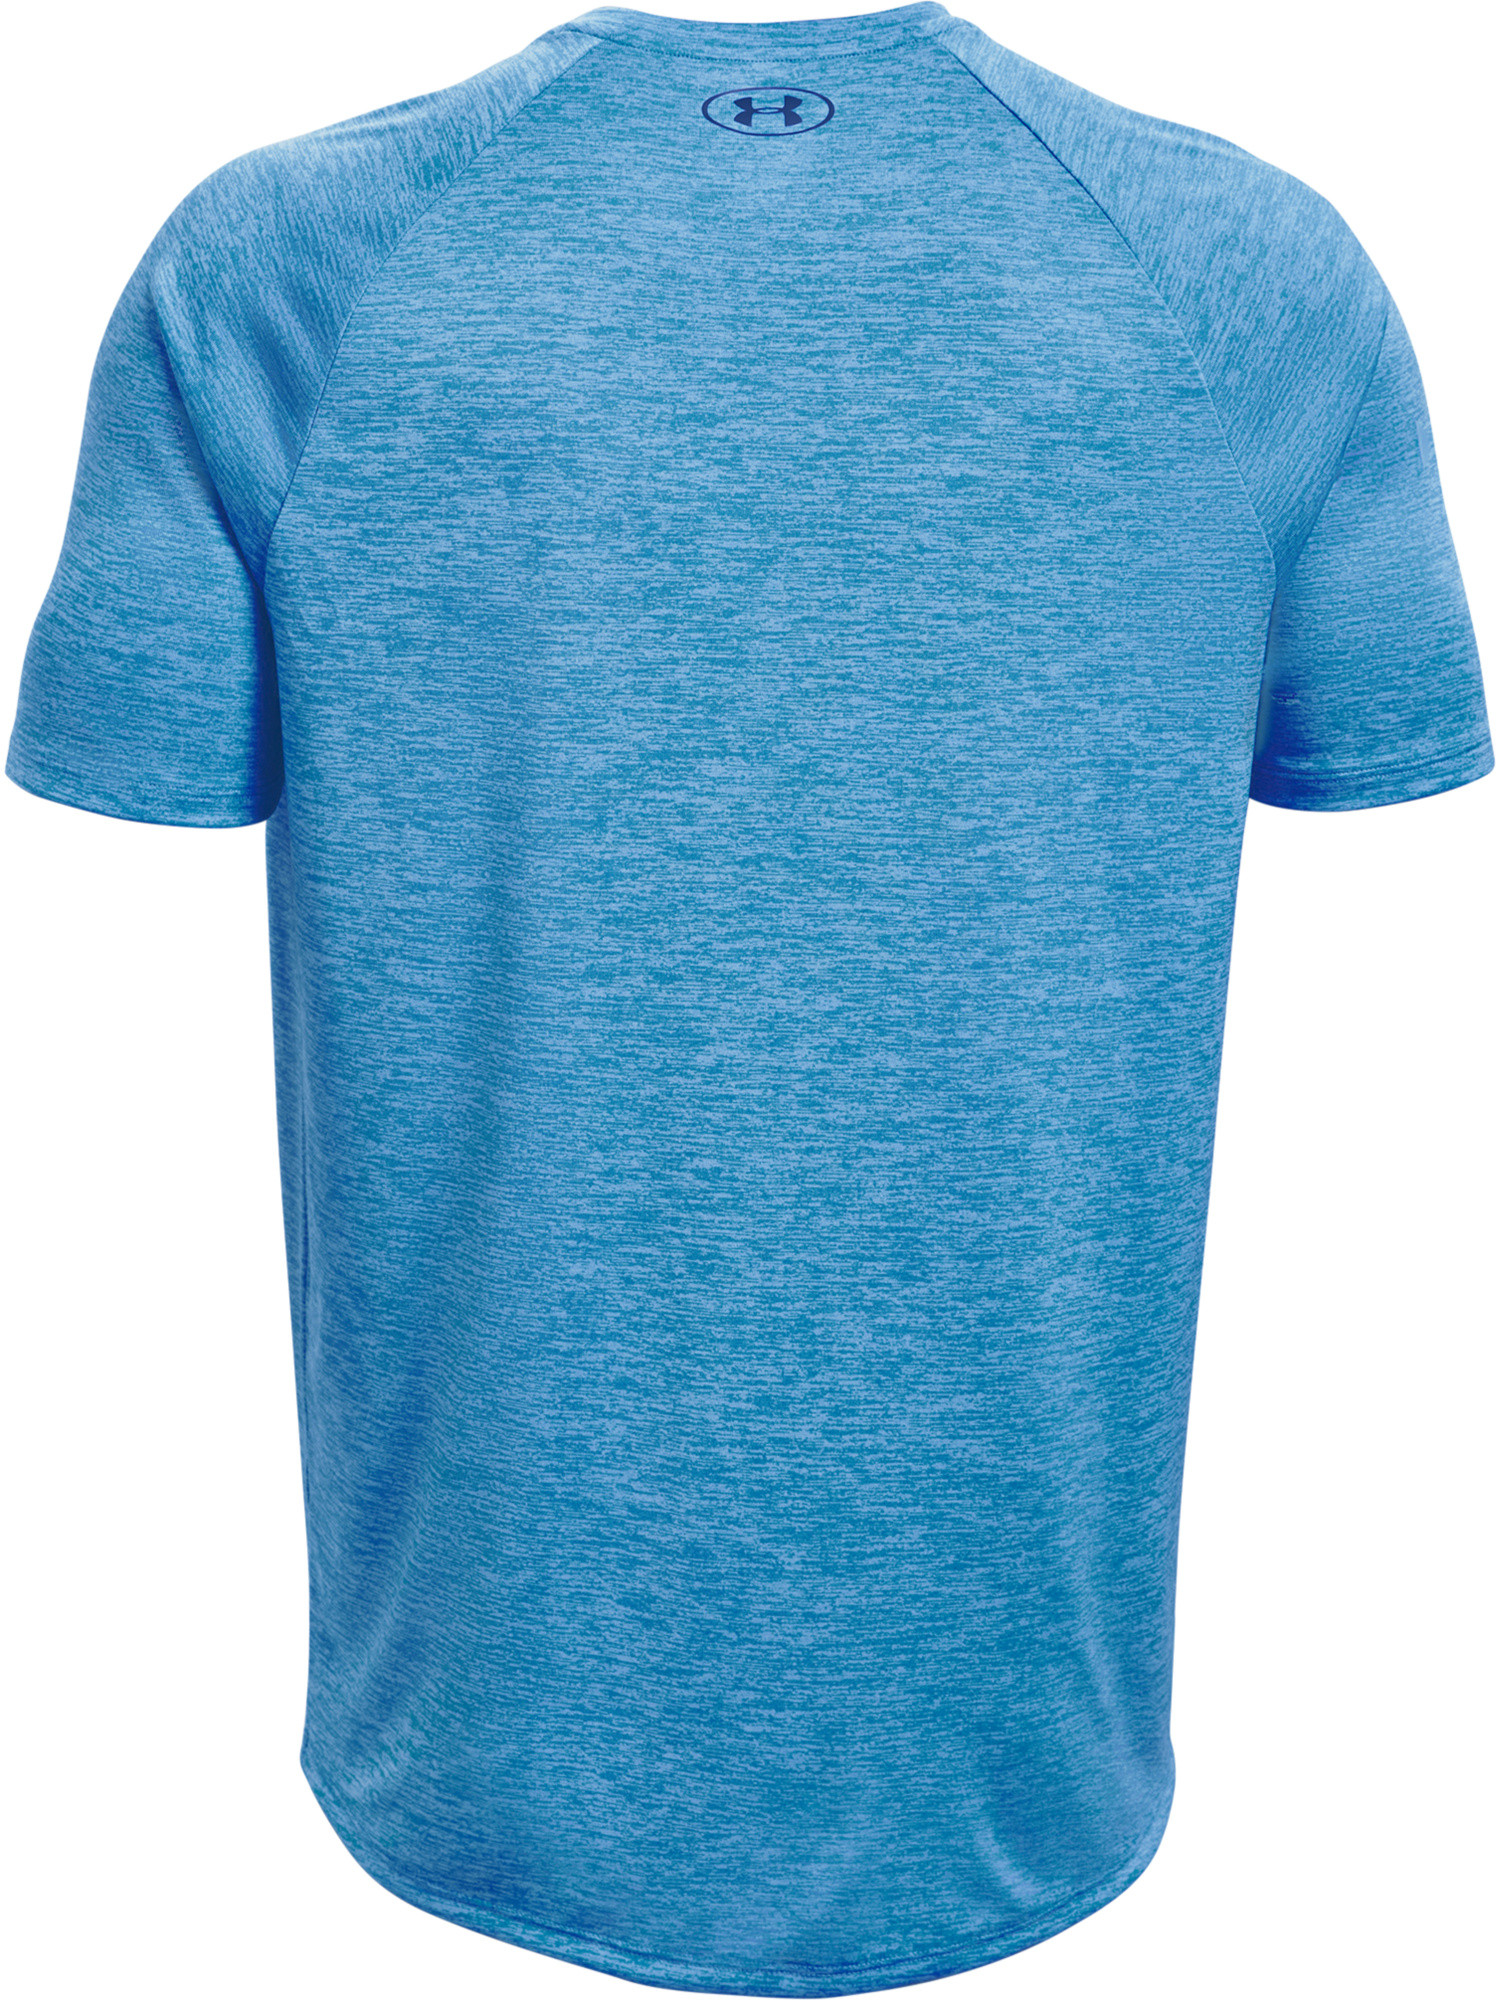 T-shirt a manica corta Tech, Blu, large image number 1